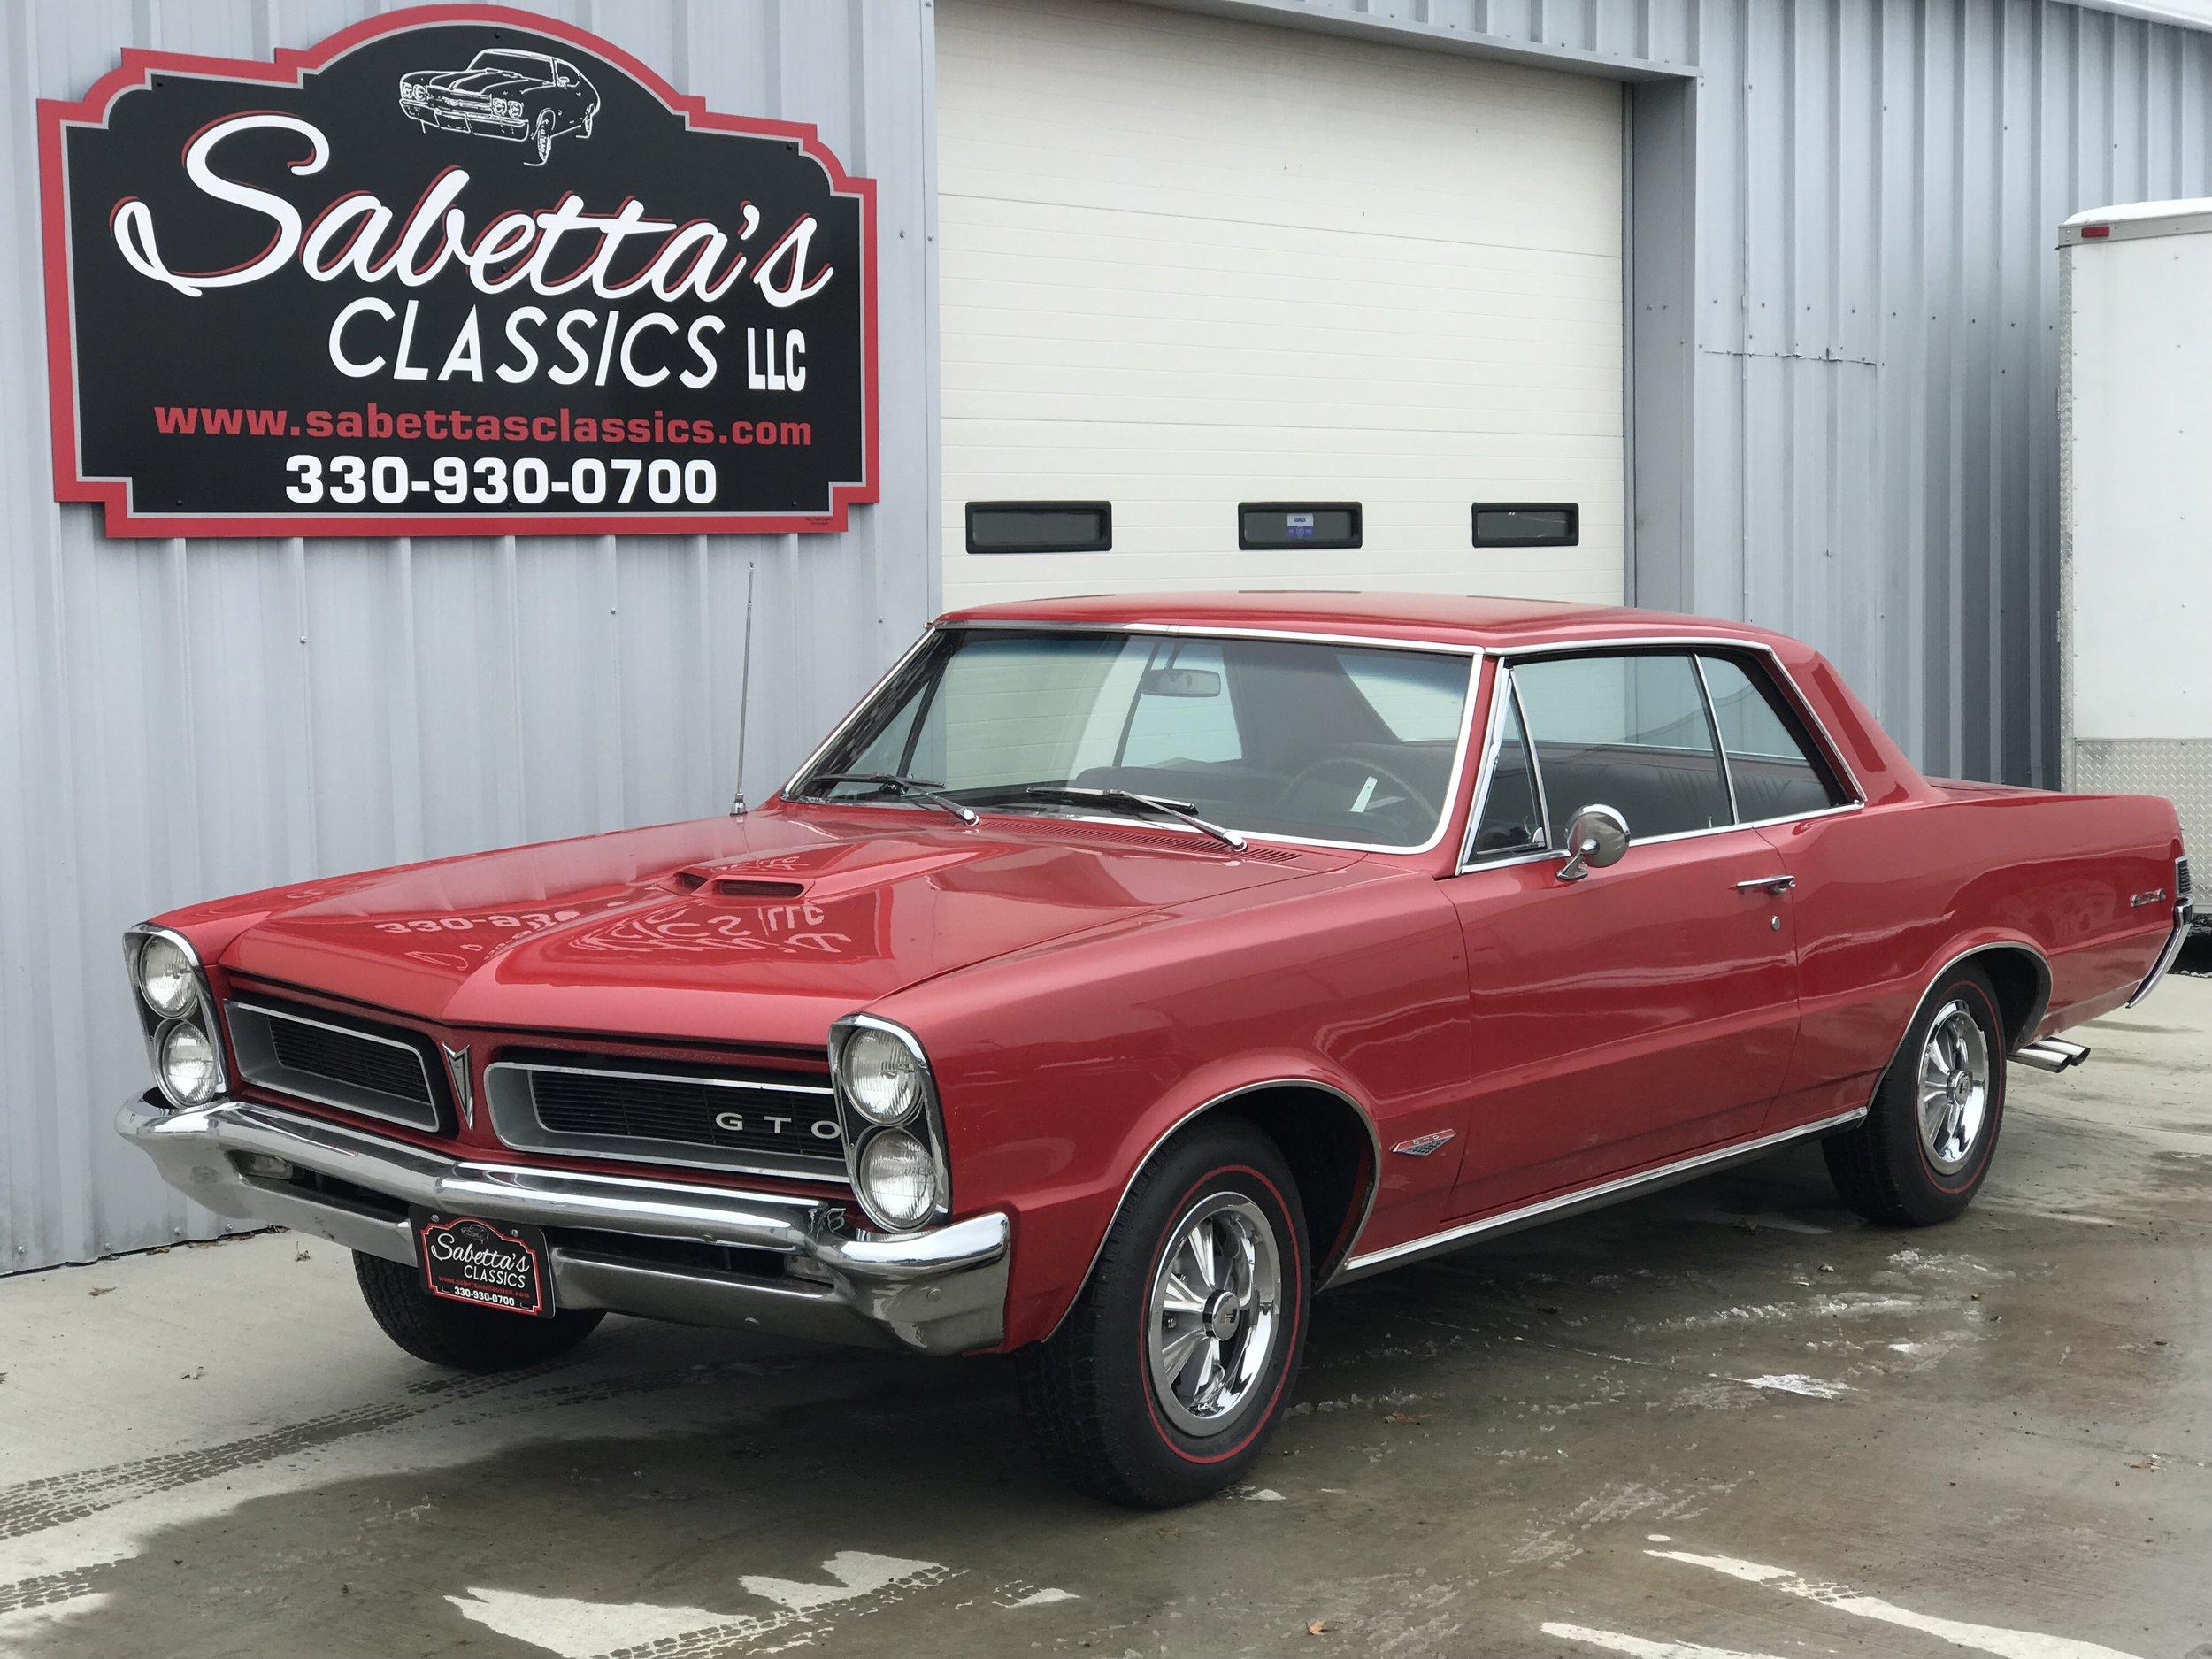 1965 GTO RED.JPG